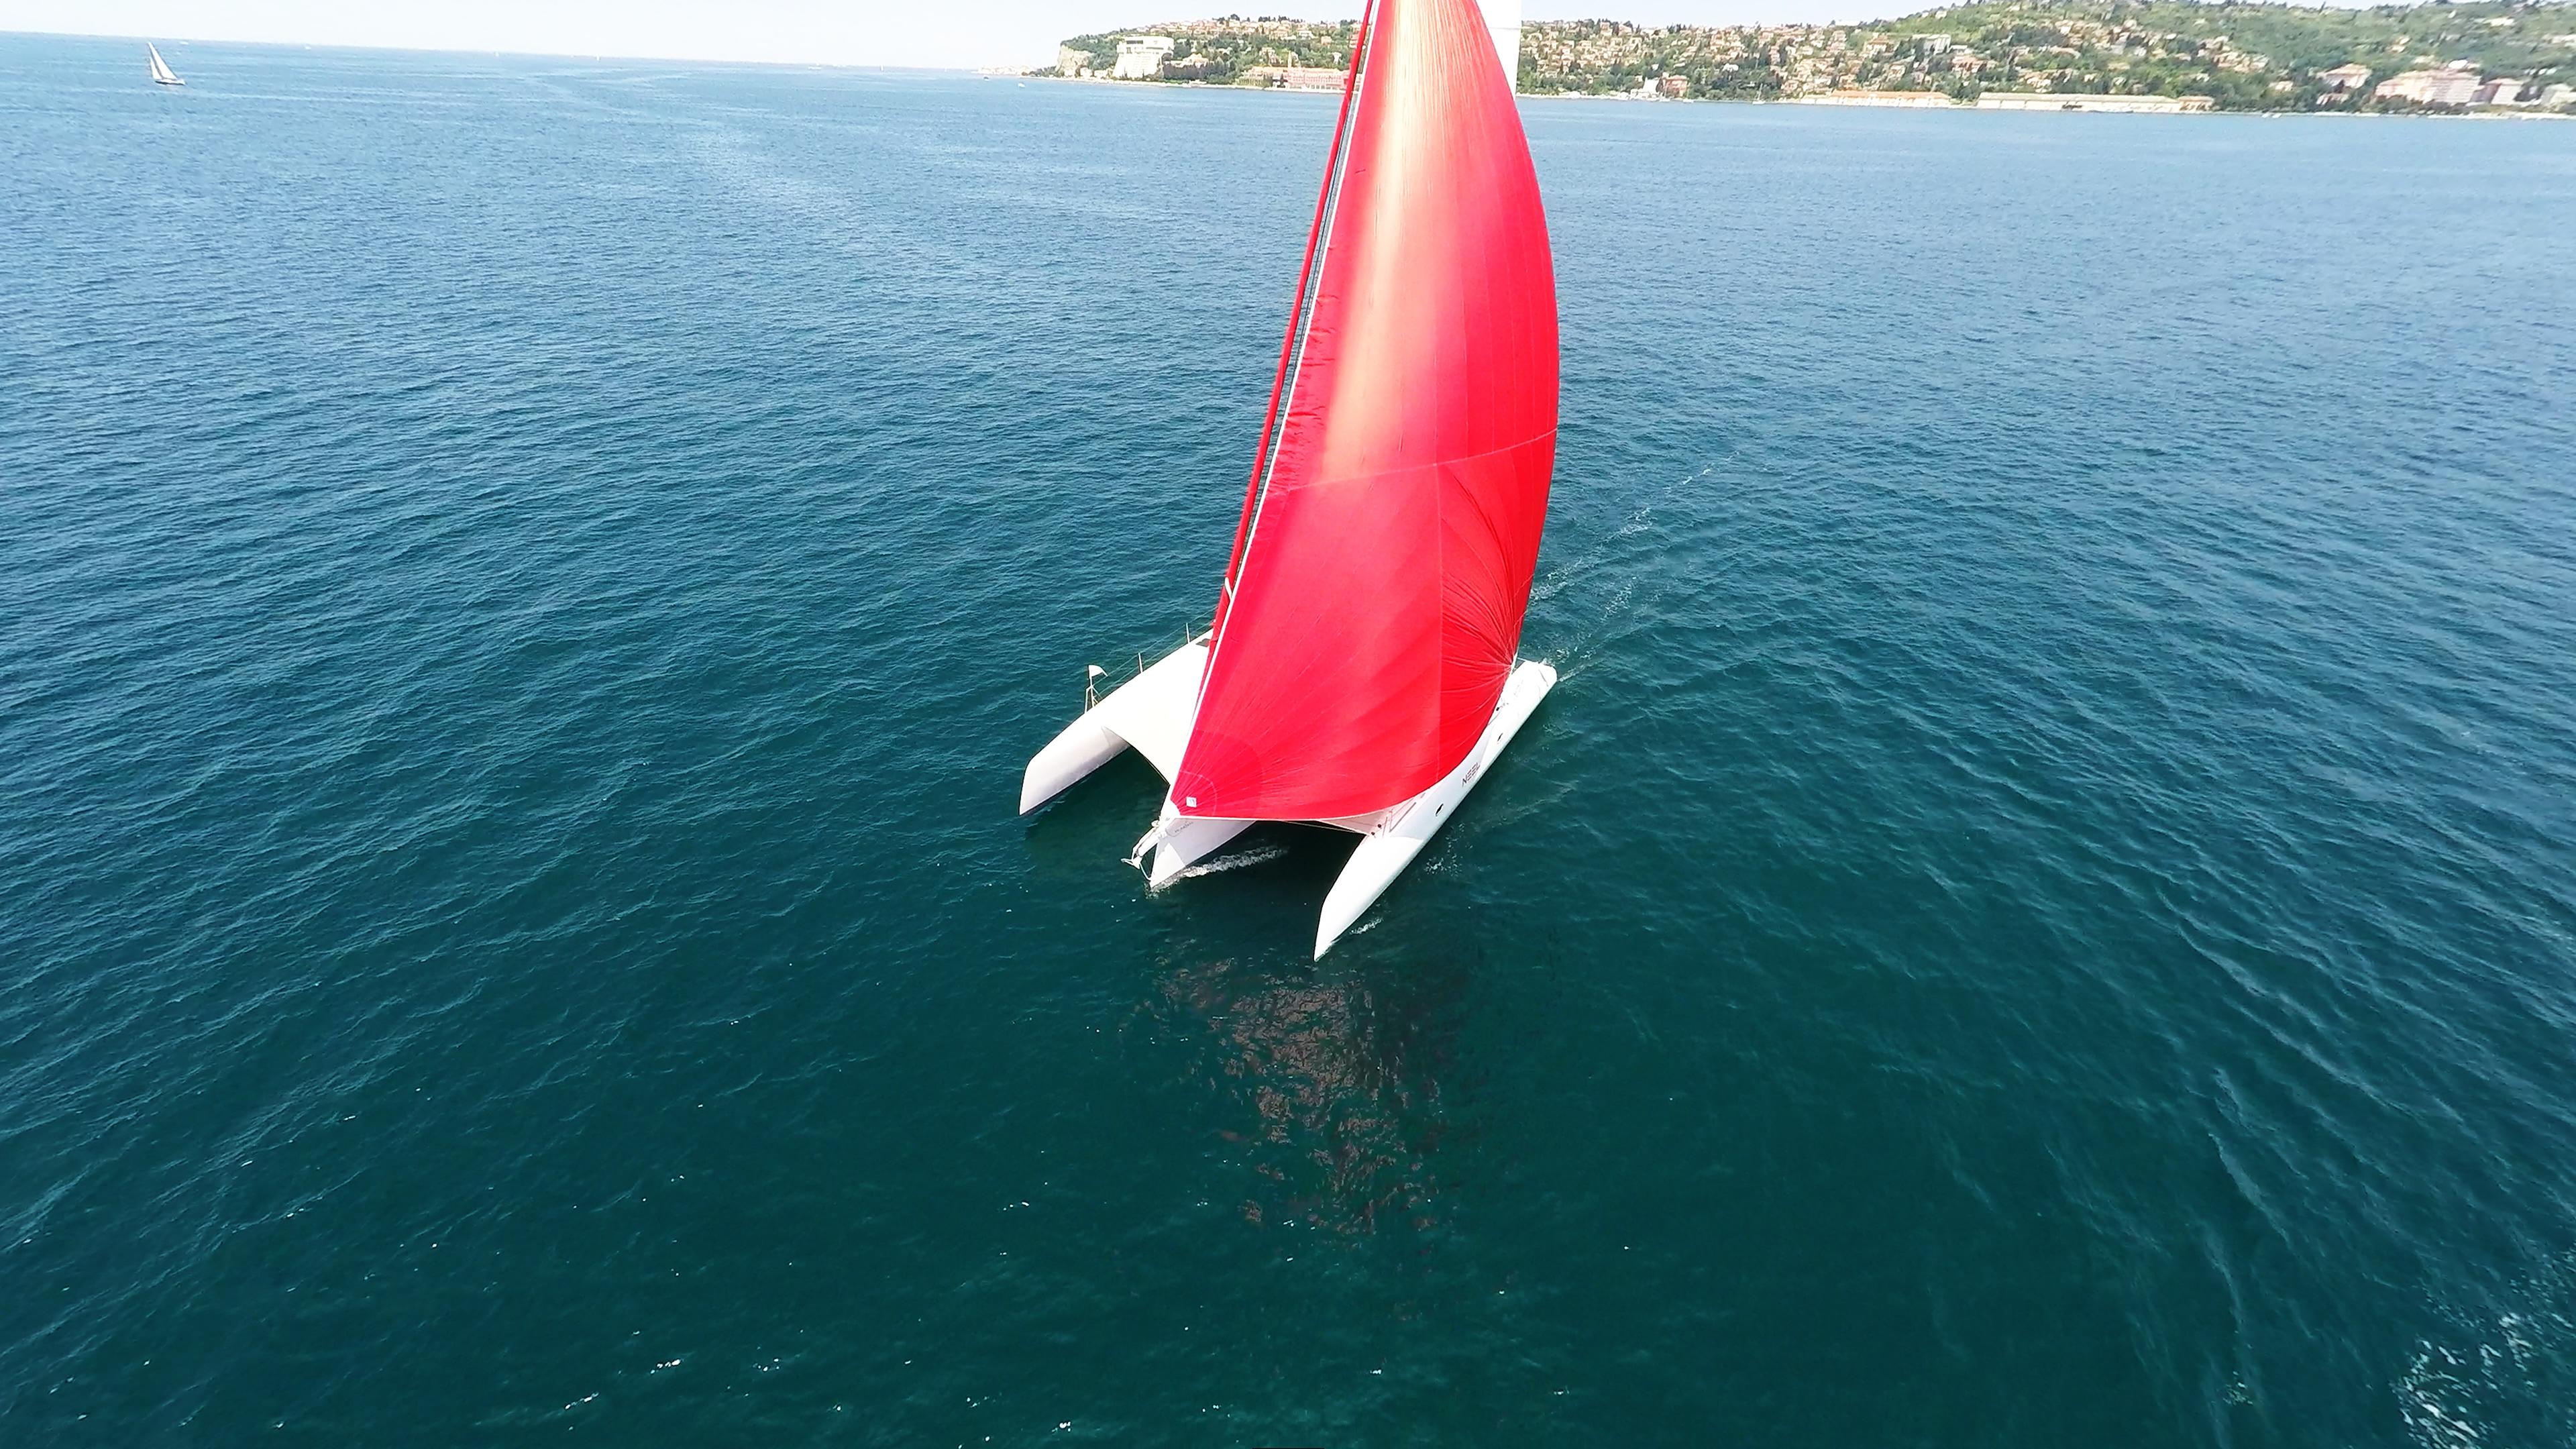 foto aerea trimarano barca a vela gennaker